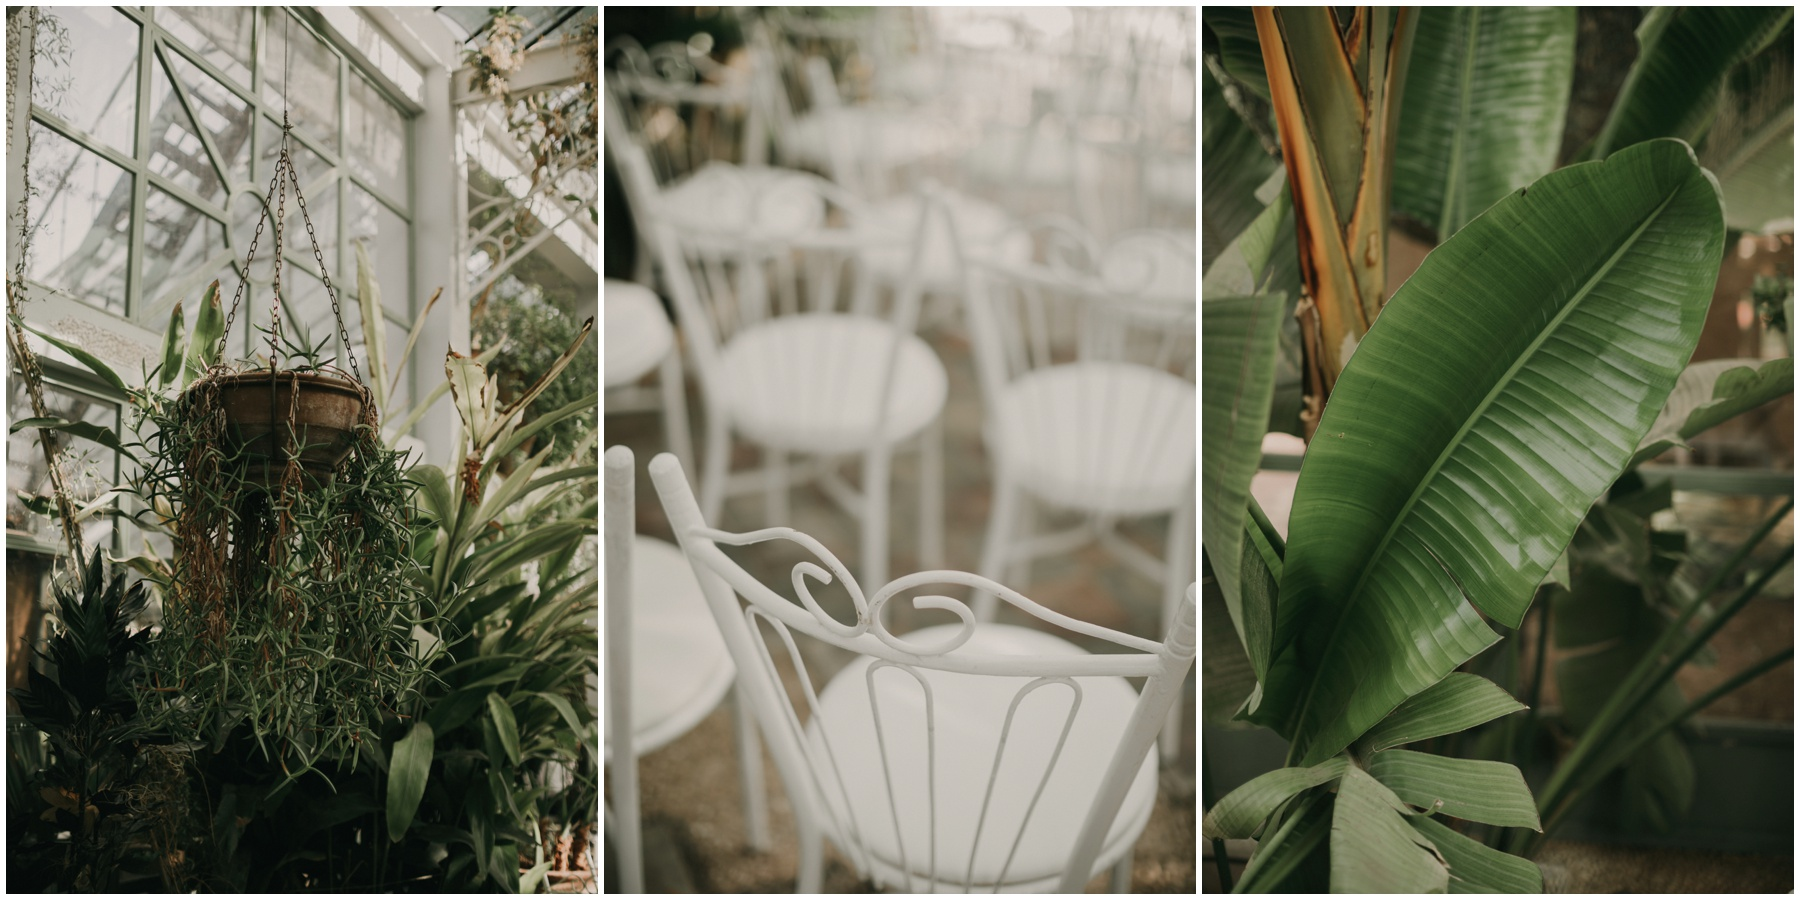 Marrakech Wedding Beldi Coutry Club 007.JPG